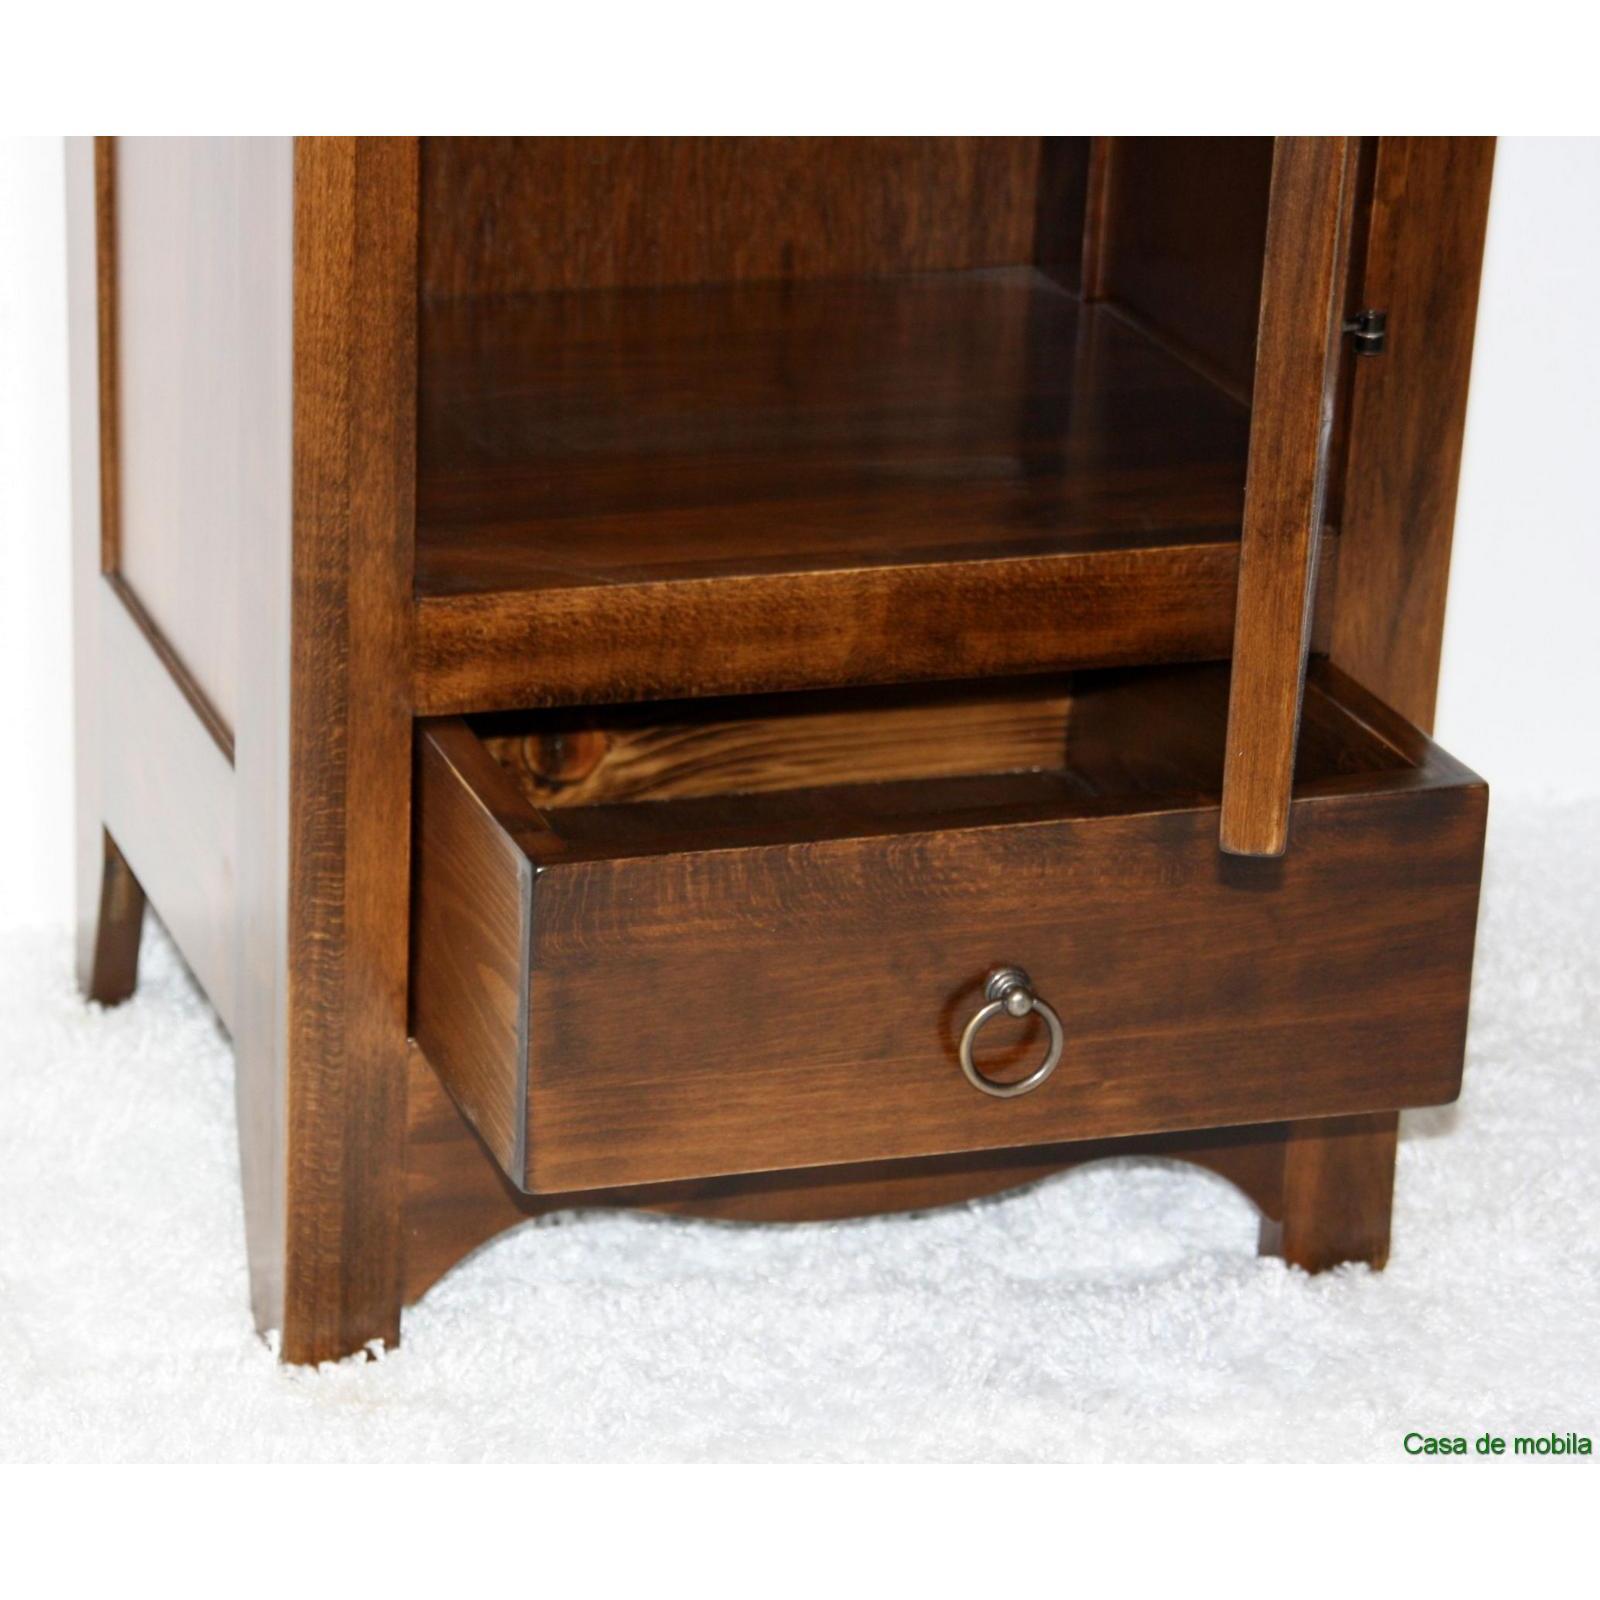 badkommode flurkommode kommode schmal braun nussbaum kolonial. Black Bedroom Furniture Sets. Home Design Ideas